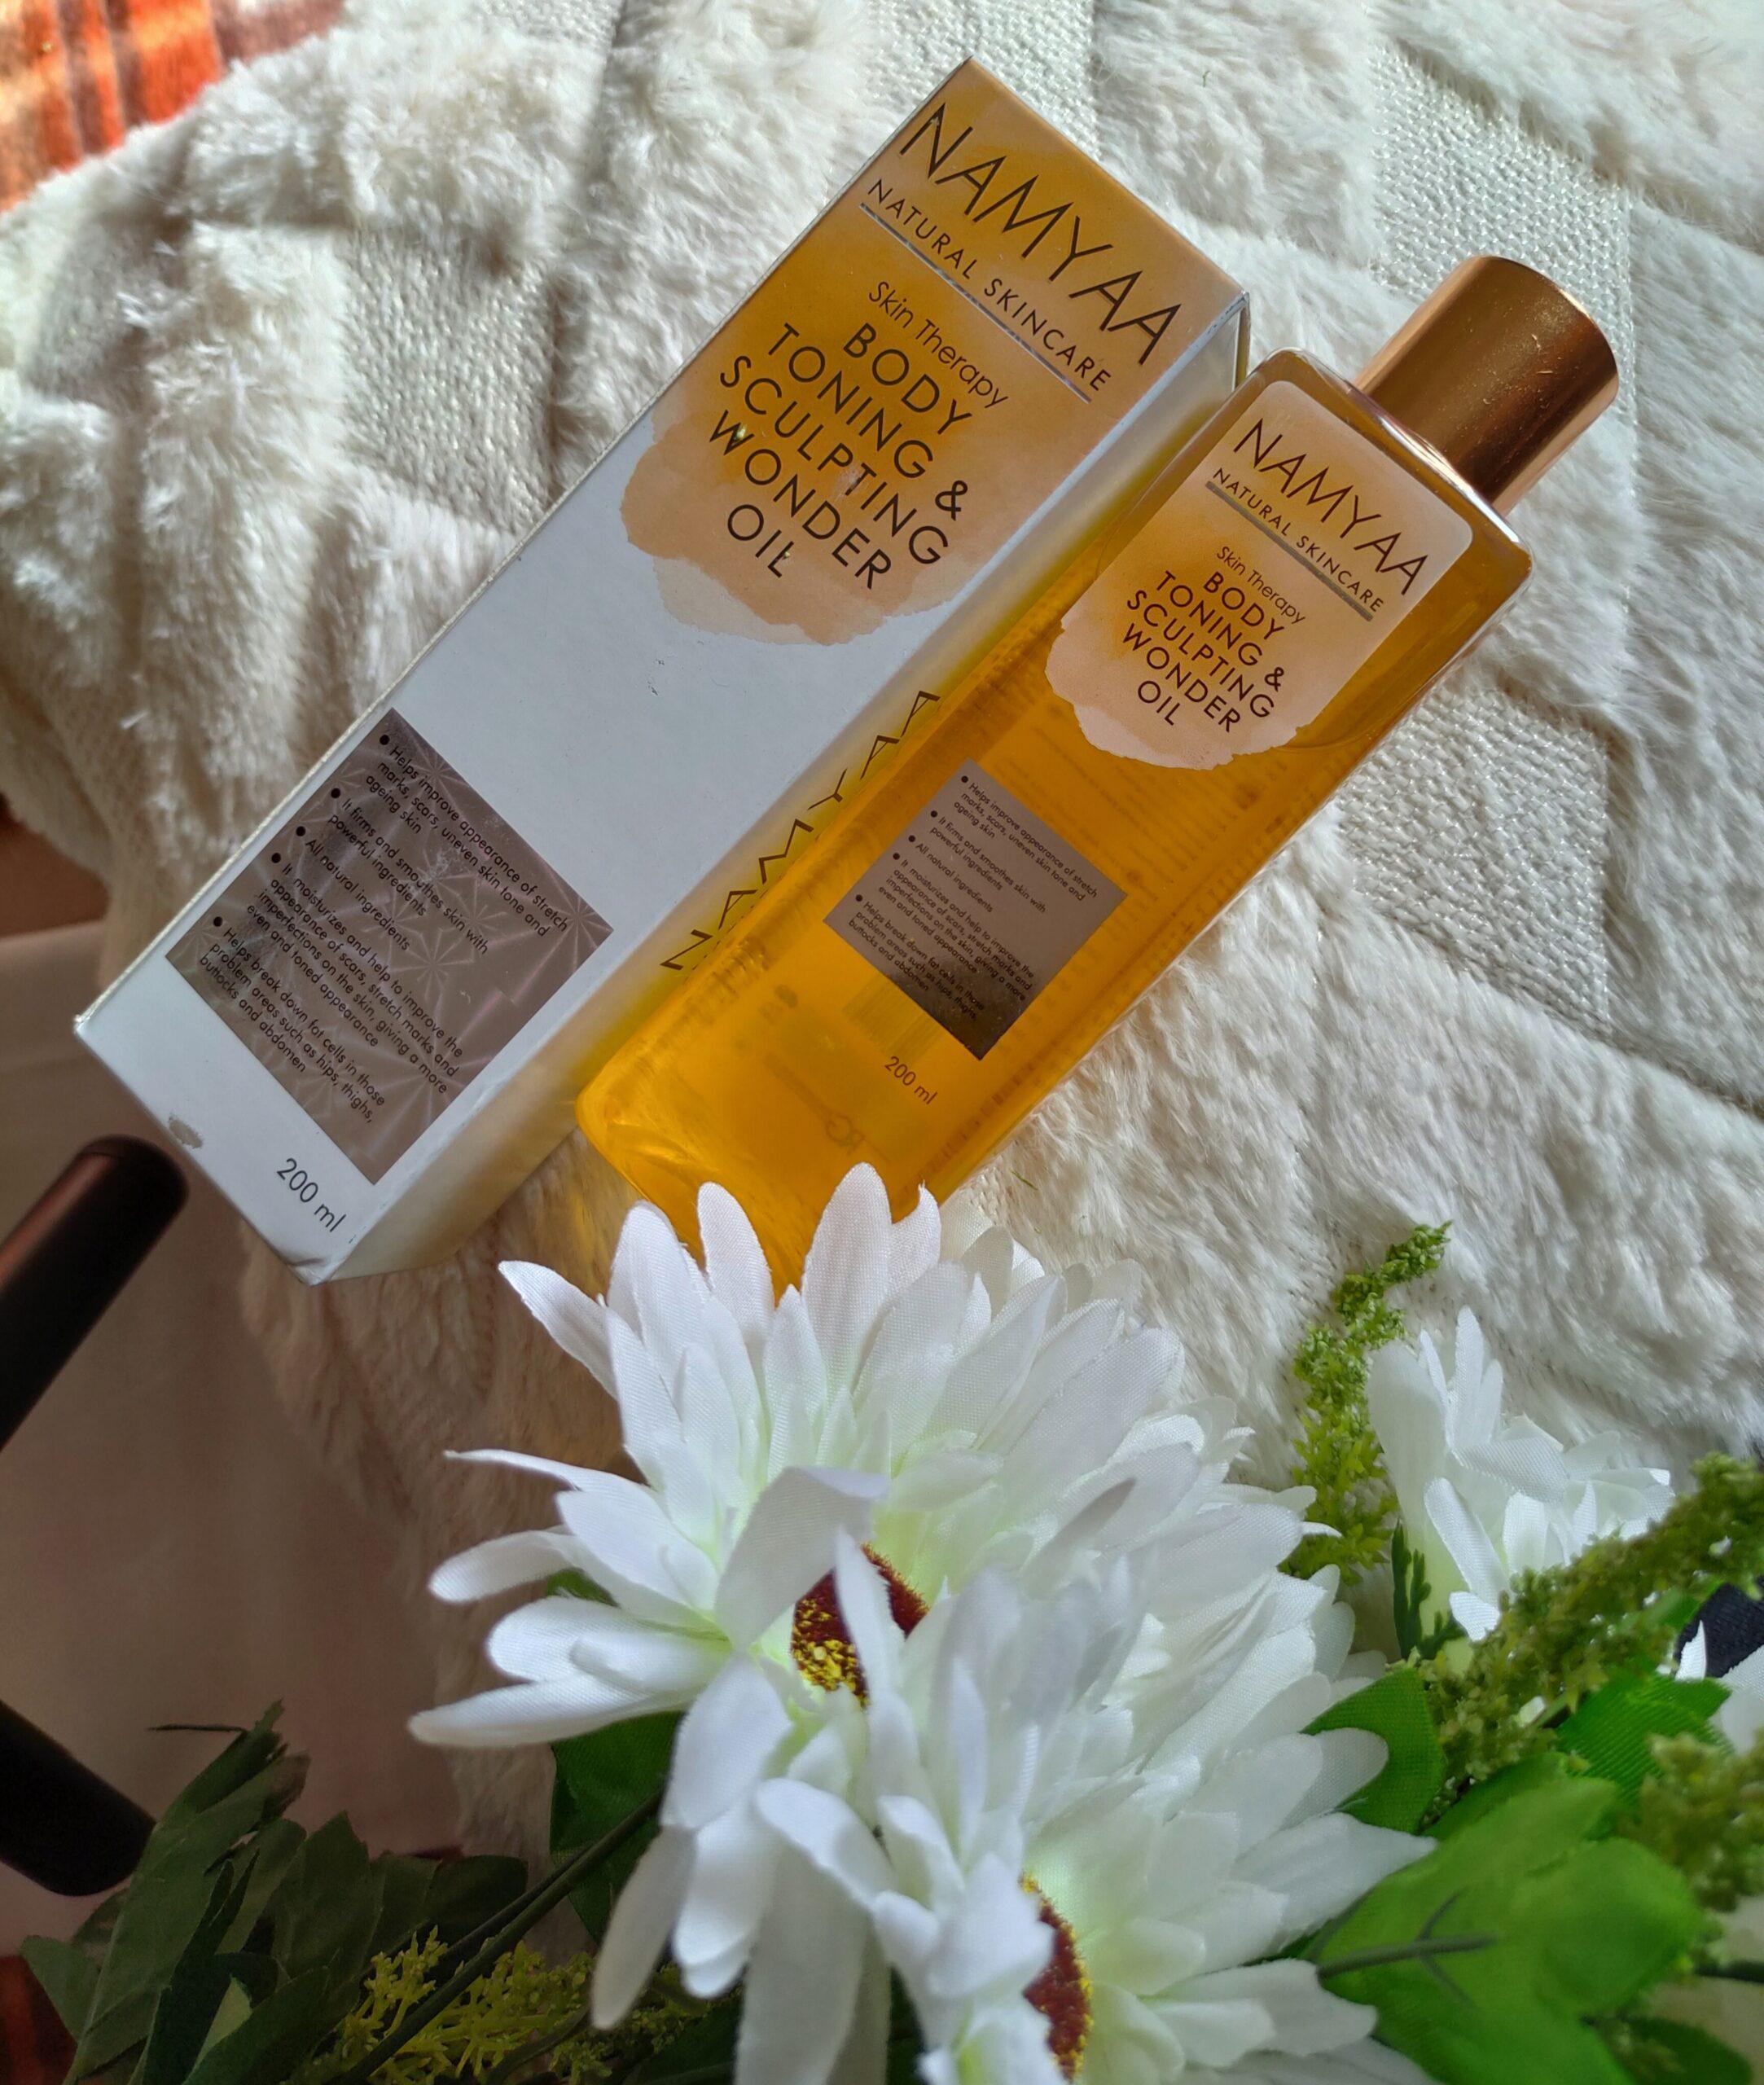 Namyaa Natural Skin Therapy Body Toning & Sculpting Wonder Oil Review